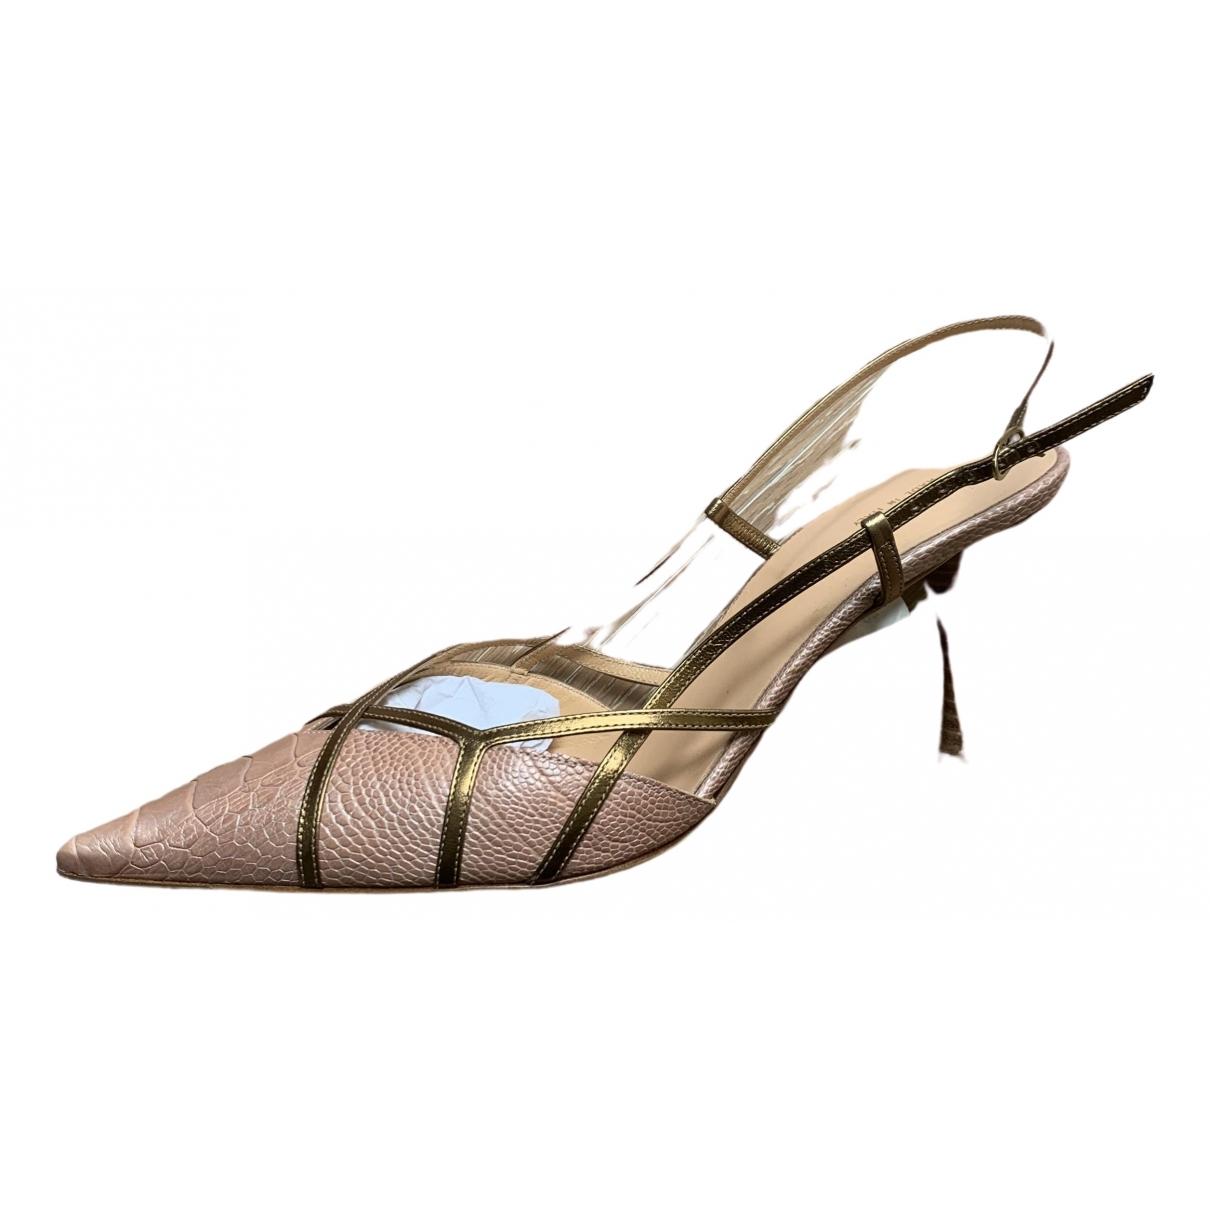 Sergio Rossi \N Metallic Exotic leathers Heels for Women 40 EU